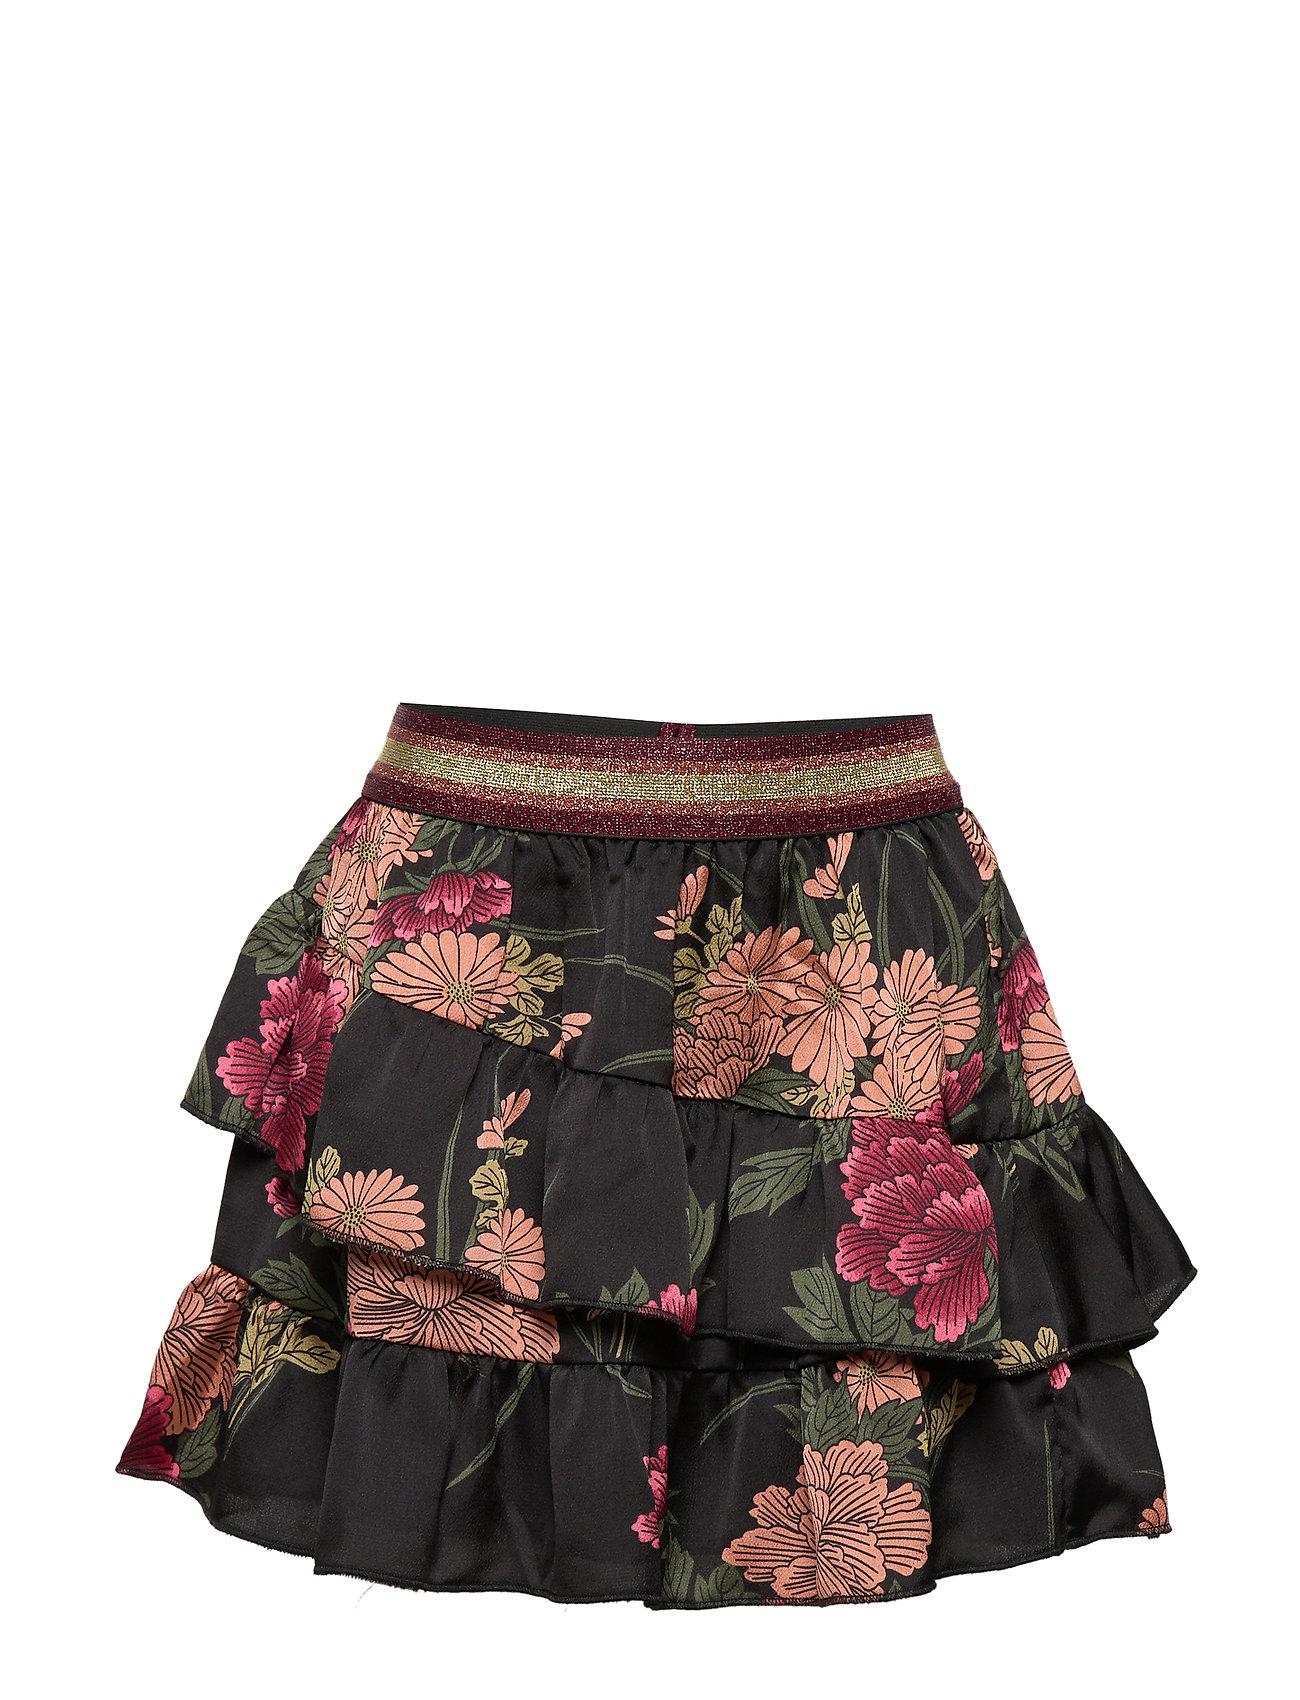 Petit by Sofie Schnoor Skirt - AOP FLOW BLK